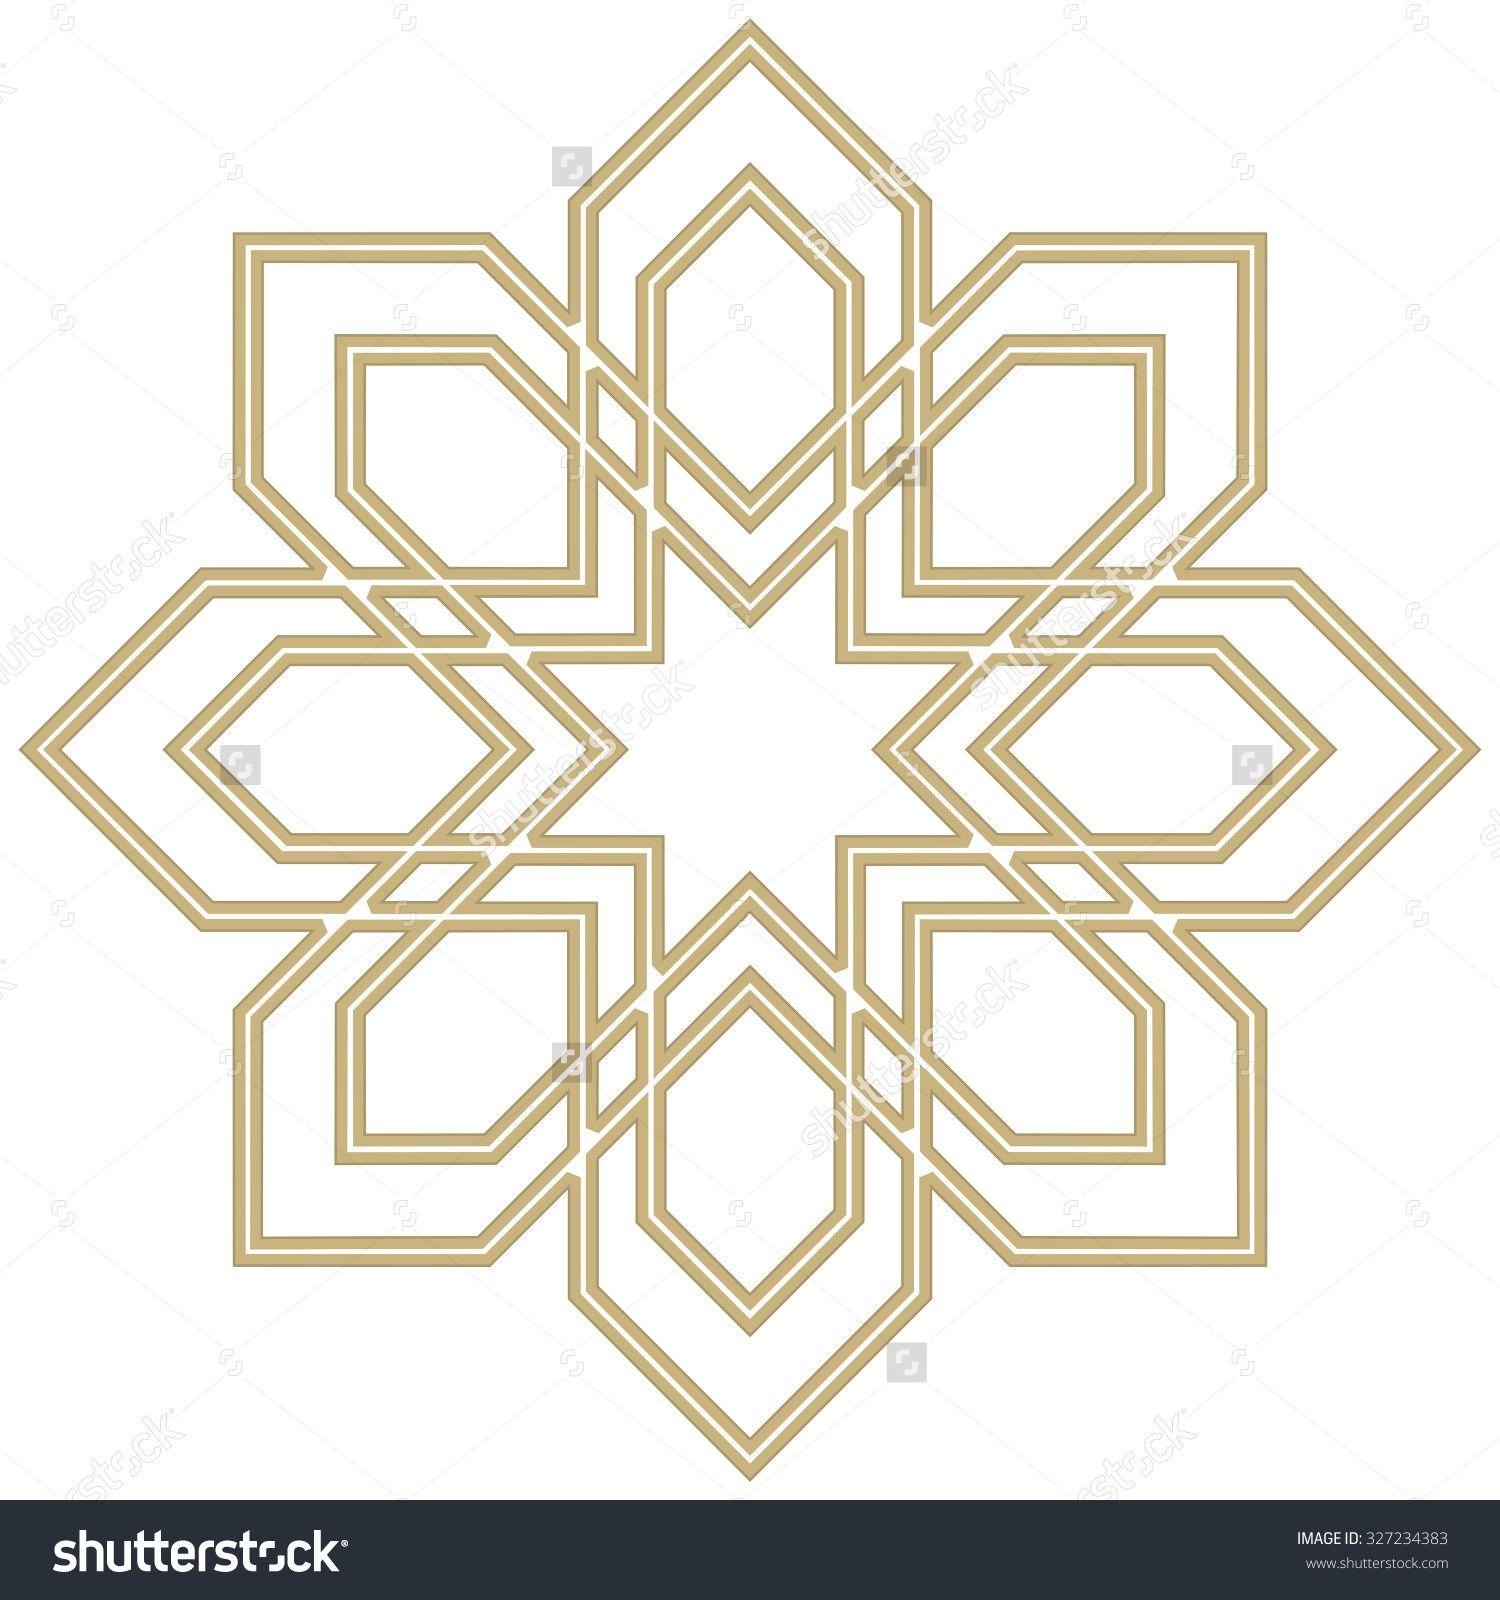 Vector Decorative Line Art Frames For Design Template. Elegant Element For Design In Eastern Style, Place For Text. Golden Outline Floral Border. Lace Illustration For Invitations And Greeting Cards - 327234383 : Shutterstock #framesandborders